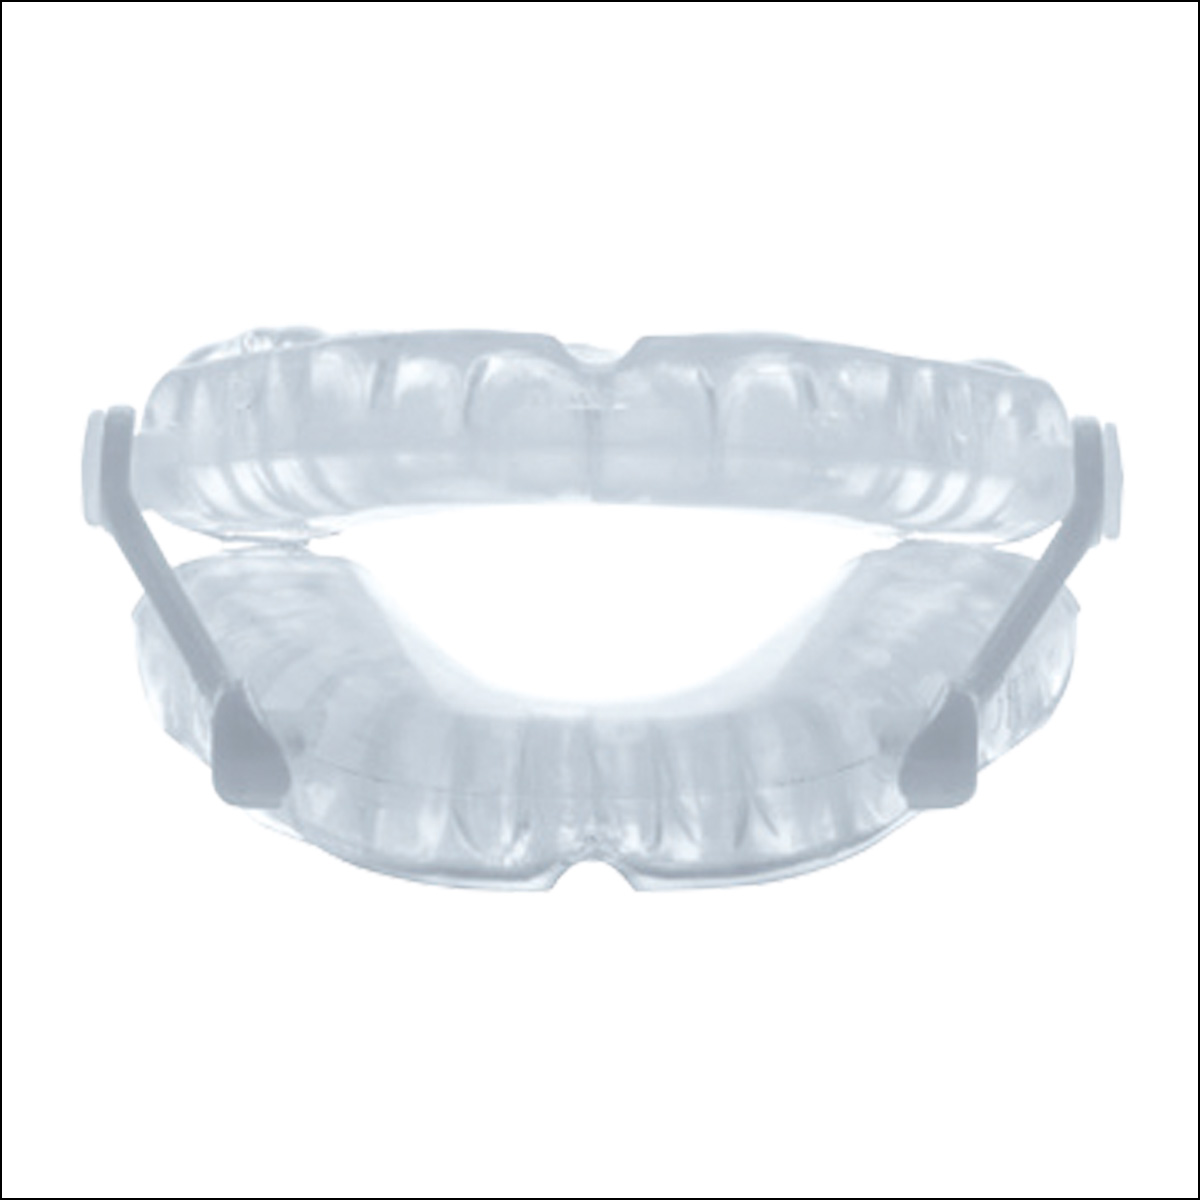 Cnsac Oniris Mandibular Protrusion Splint Cnsac